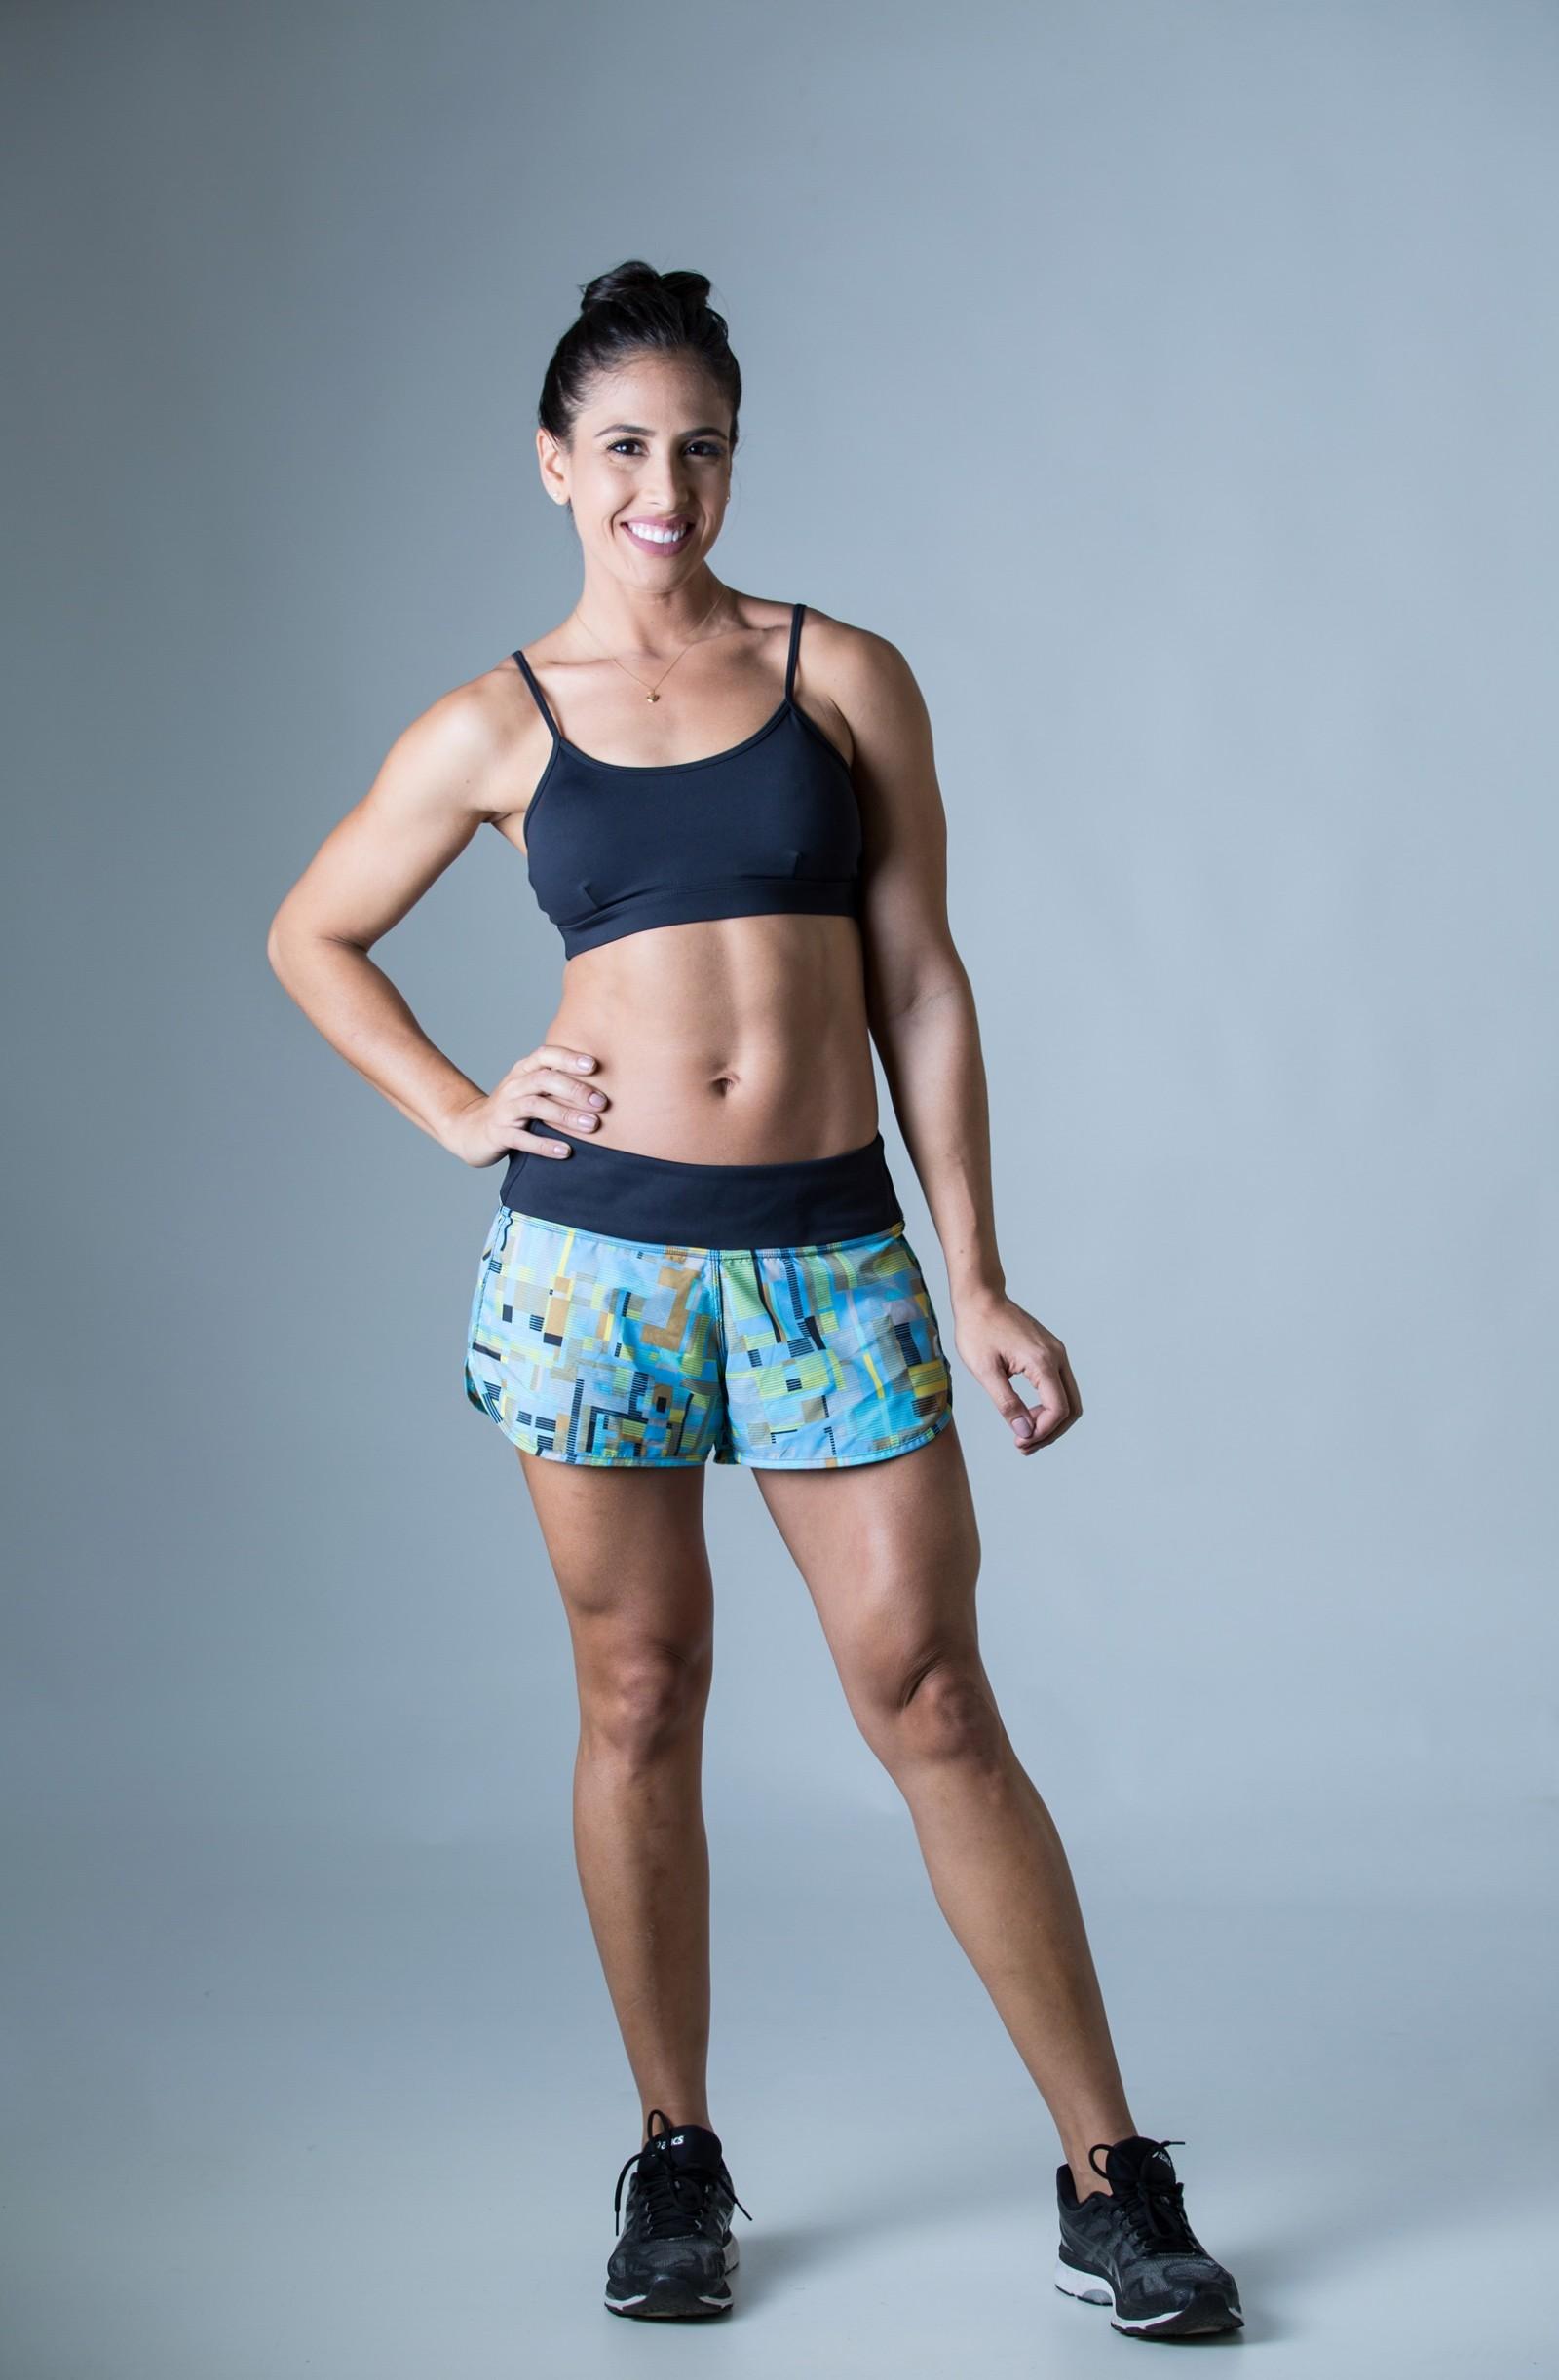 Top Profusion Preto, Coleção Plenitude - NKT Fitwear Moda Fitness